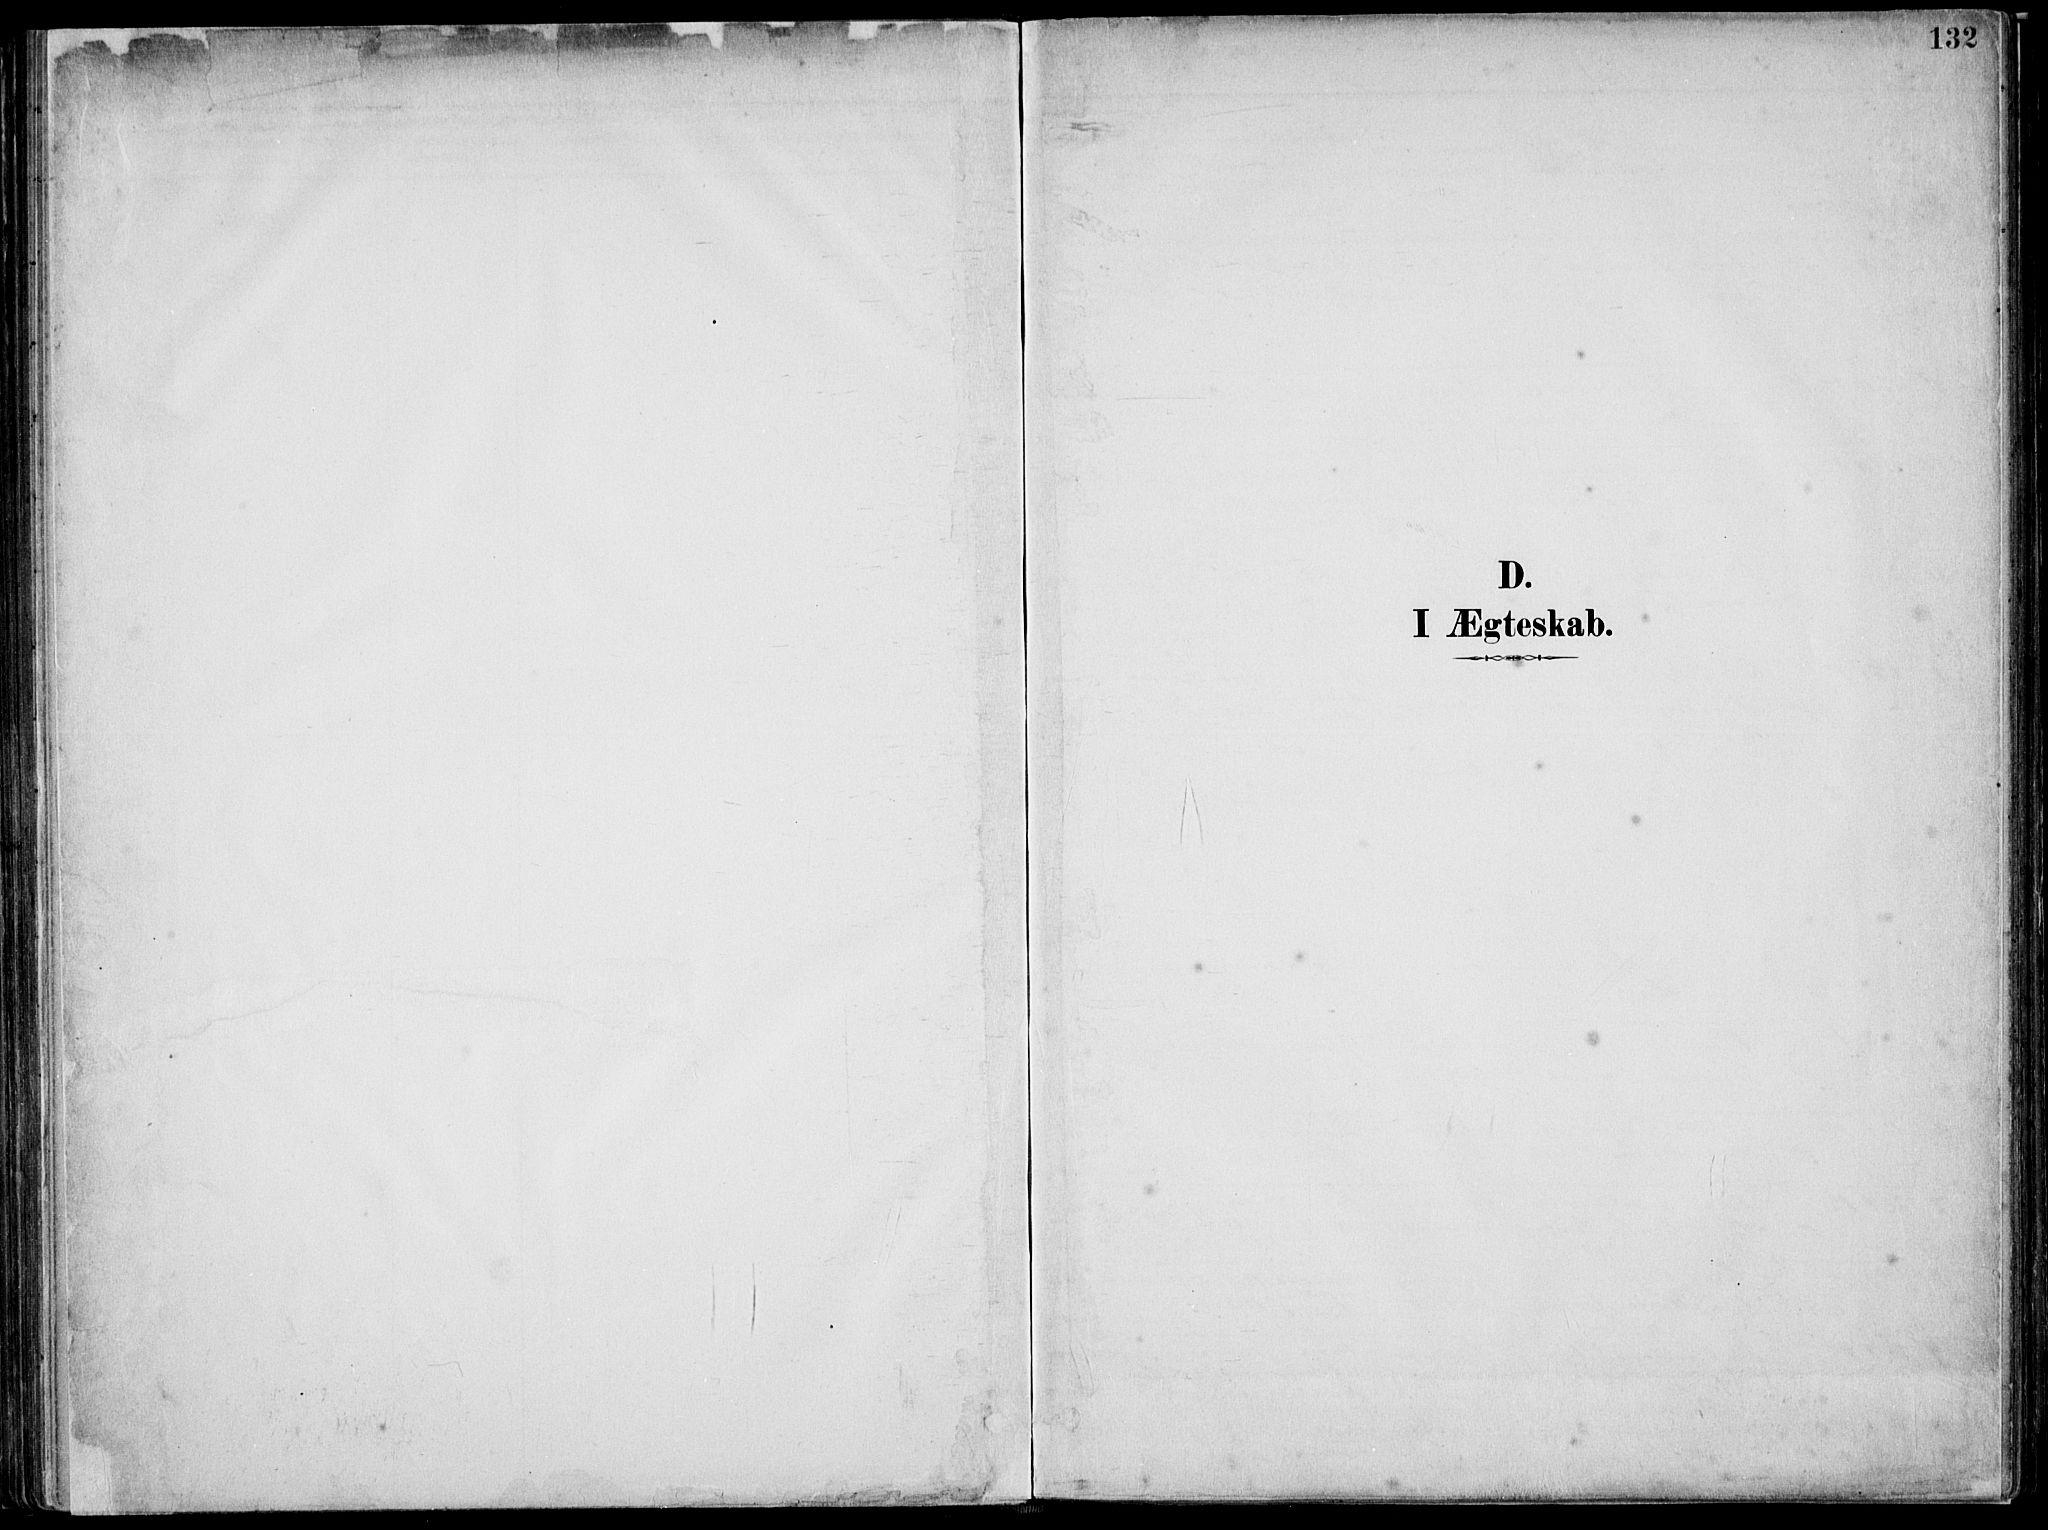 SAST, Skjold sokneprestkontor, H/Ha/Haa/L0010: Ministerialbok nr. A 10, 1882-1897, s. 132